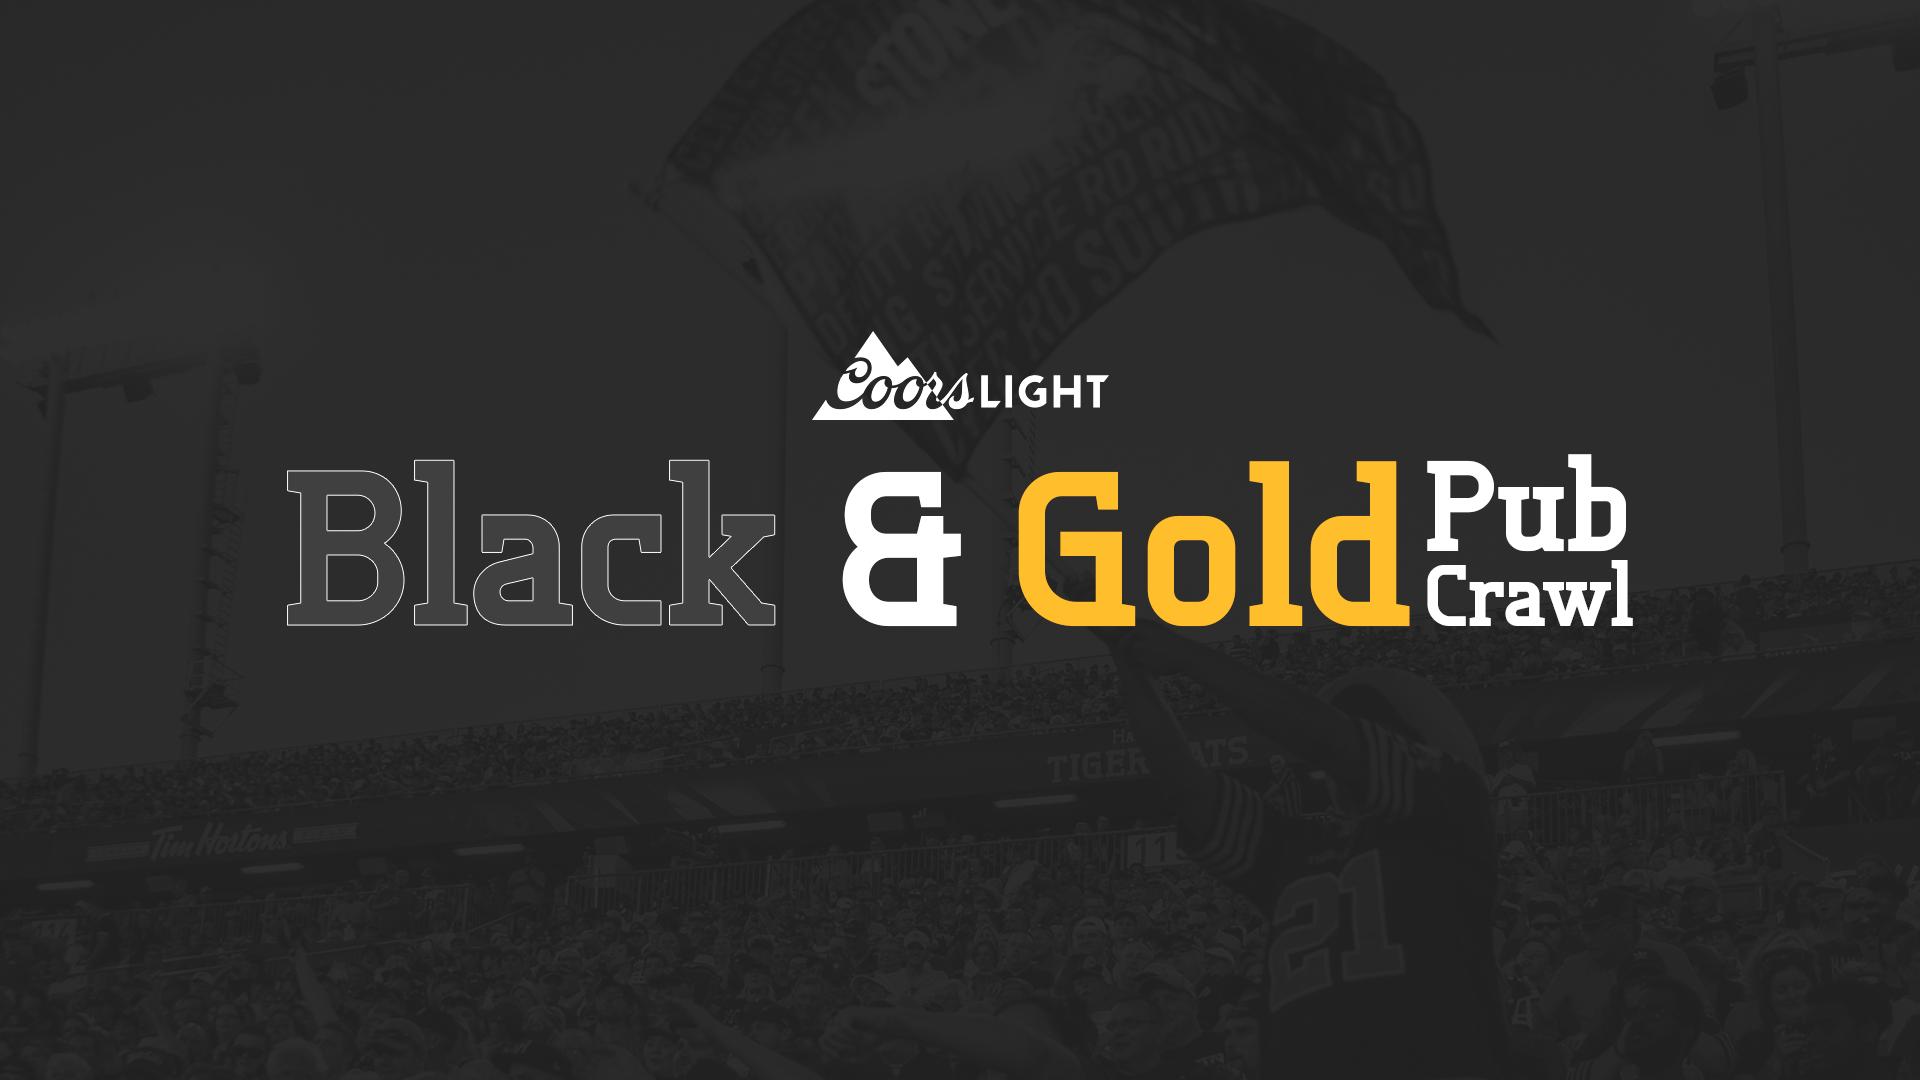 Black & Gold Pubcrawl Title Card